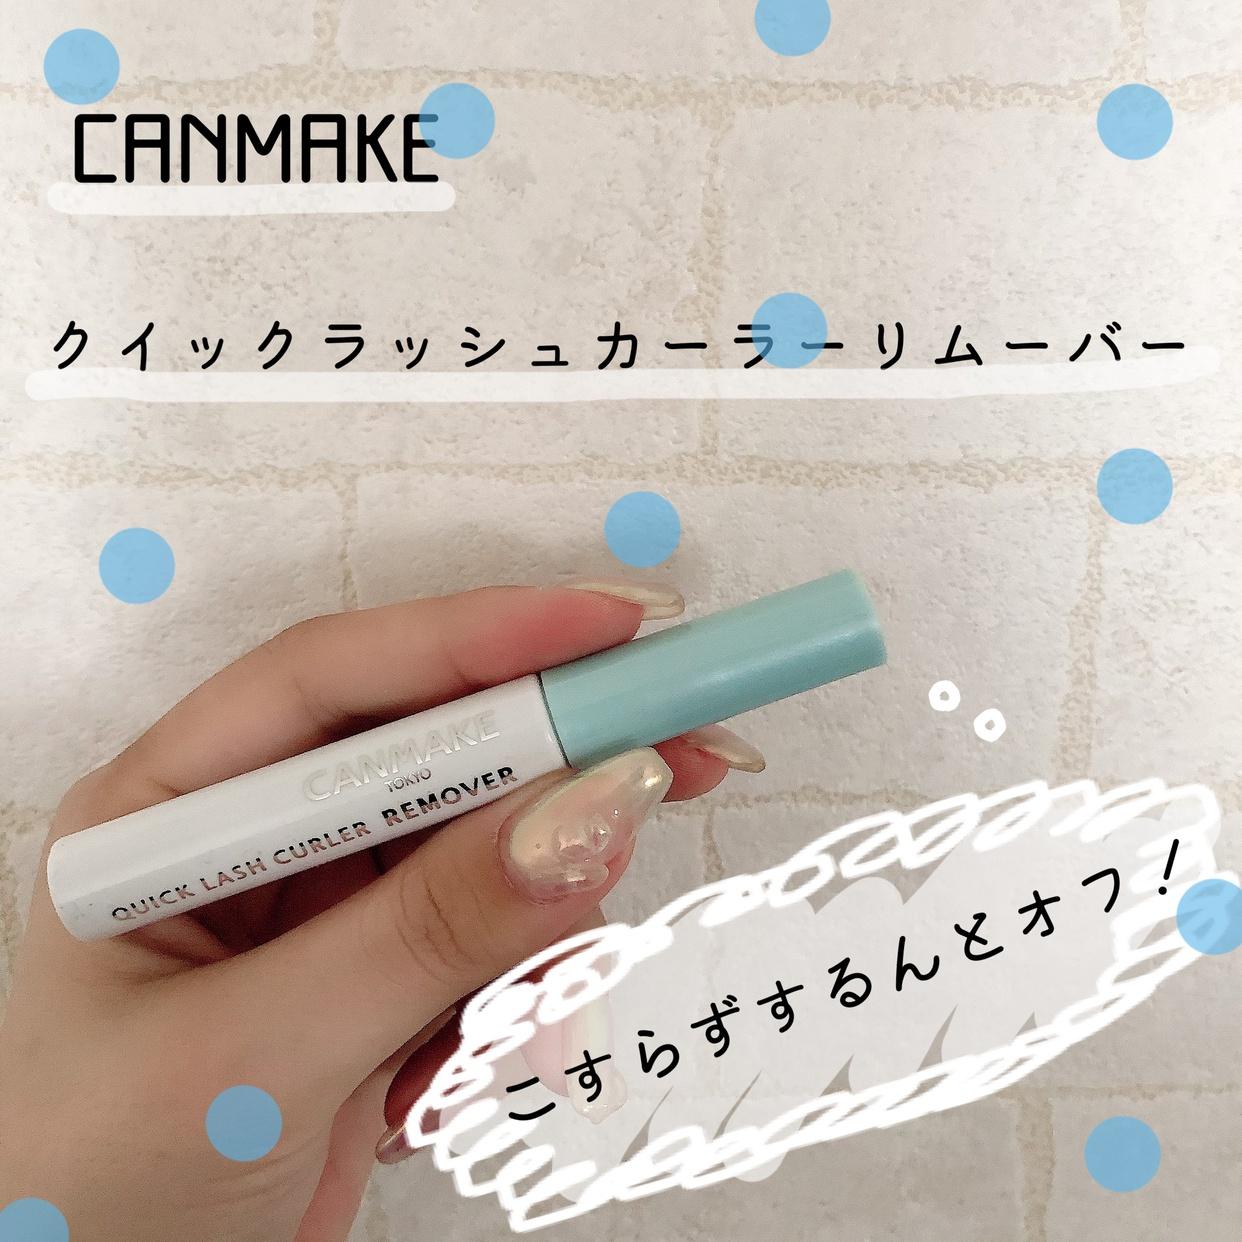 CANMAKE(キャンメイク)クイックラッシュカーラーリムーバーを使ったぴょんさんのクチコミ画像1